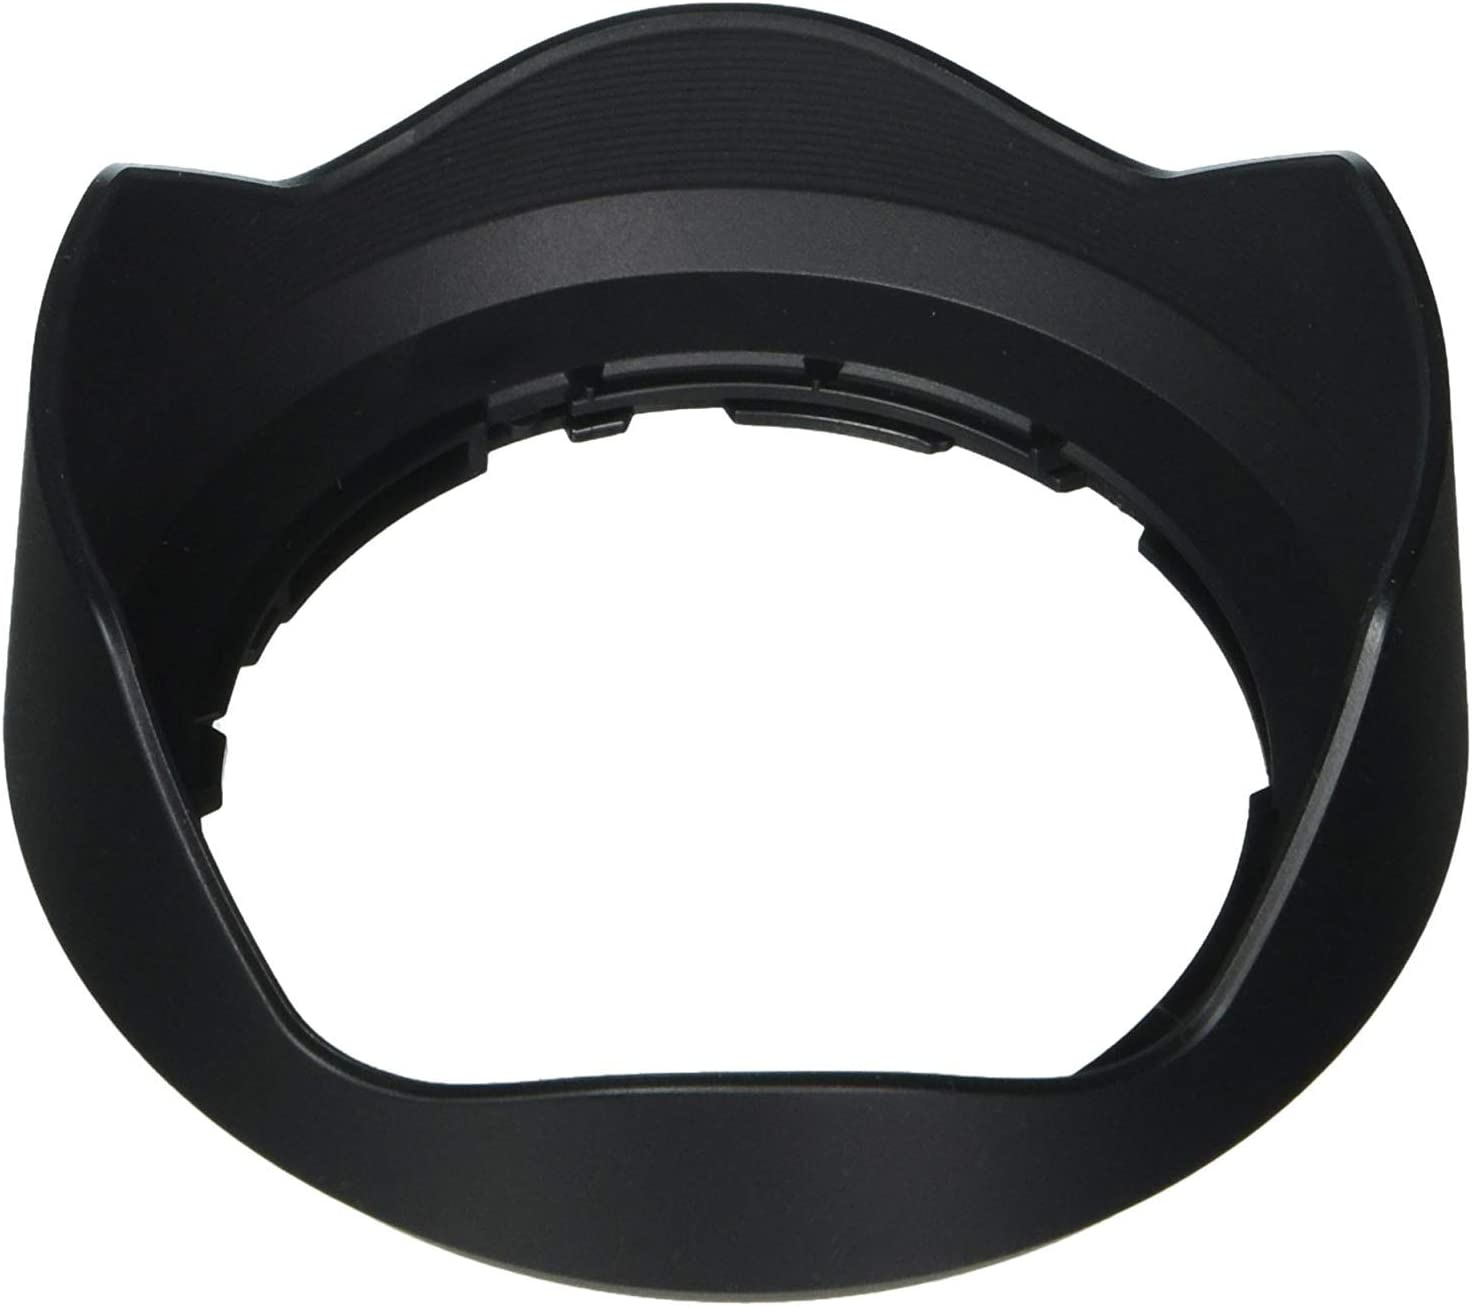 Petal Design DC-FZ1000 II Pro Digital Lens Hood Panasonic Lumix DMC-FZ1000